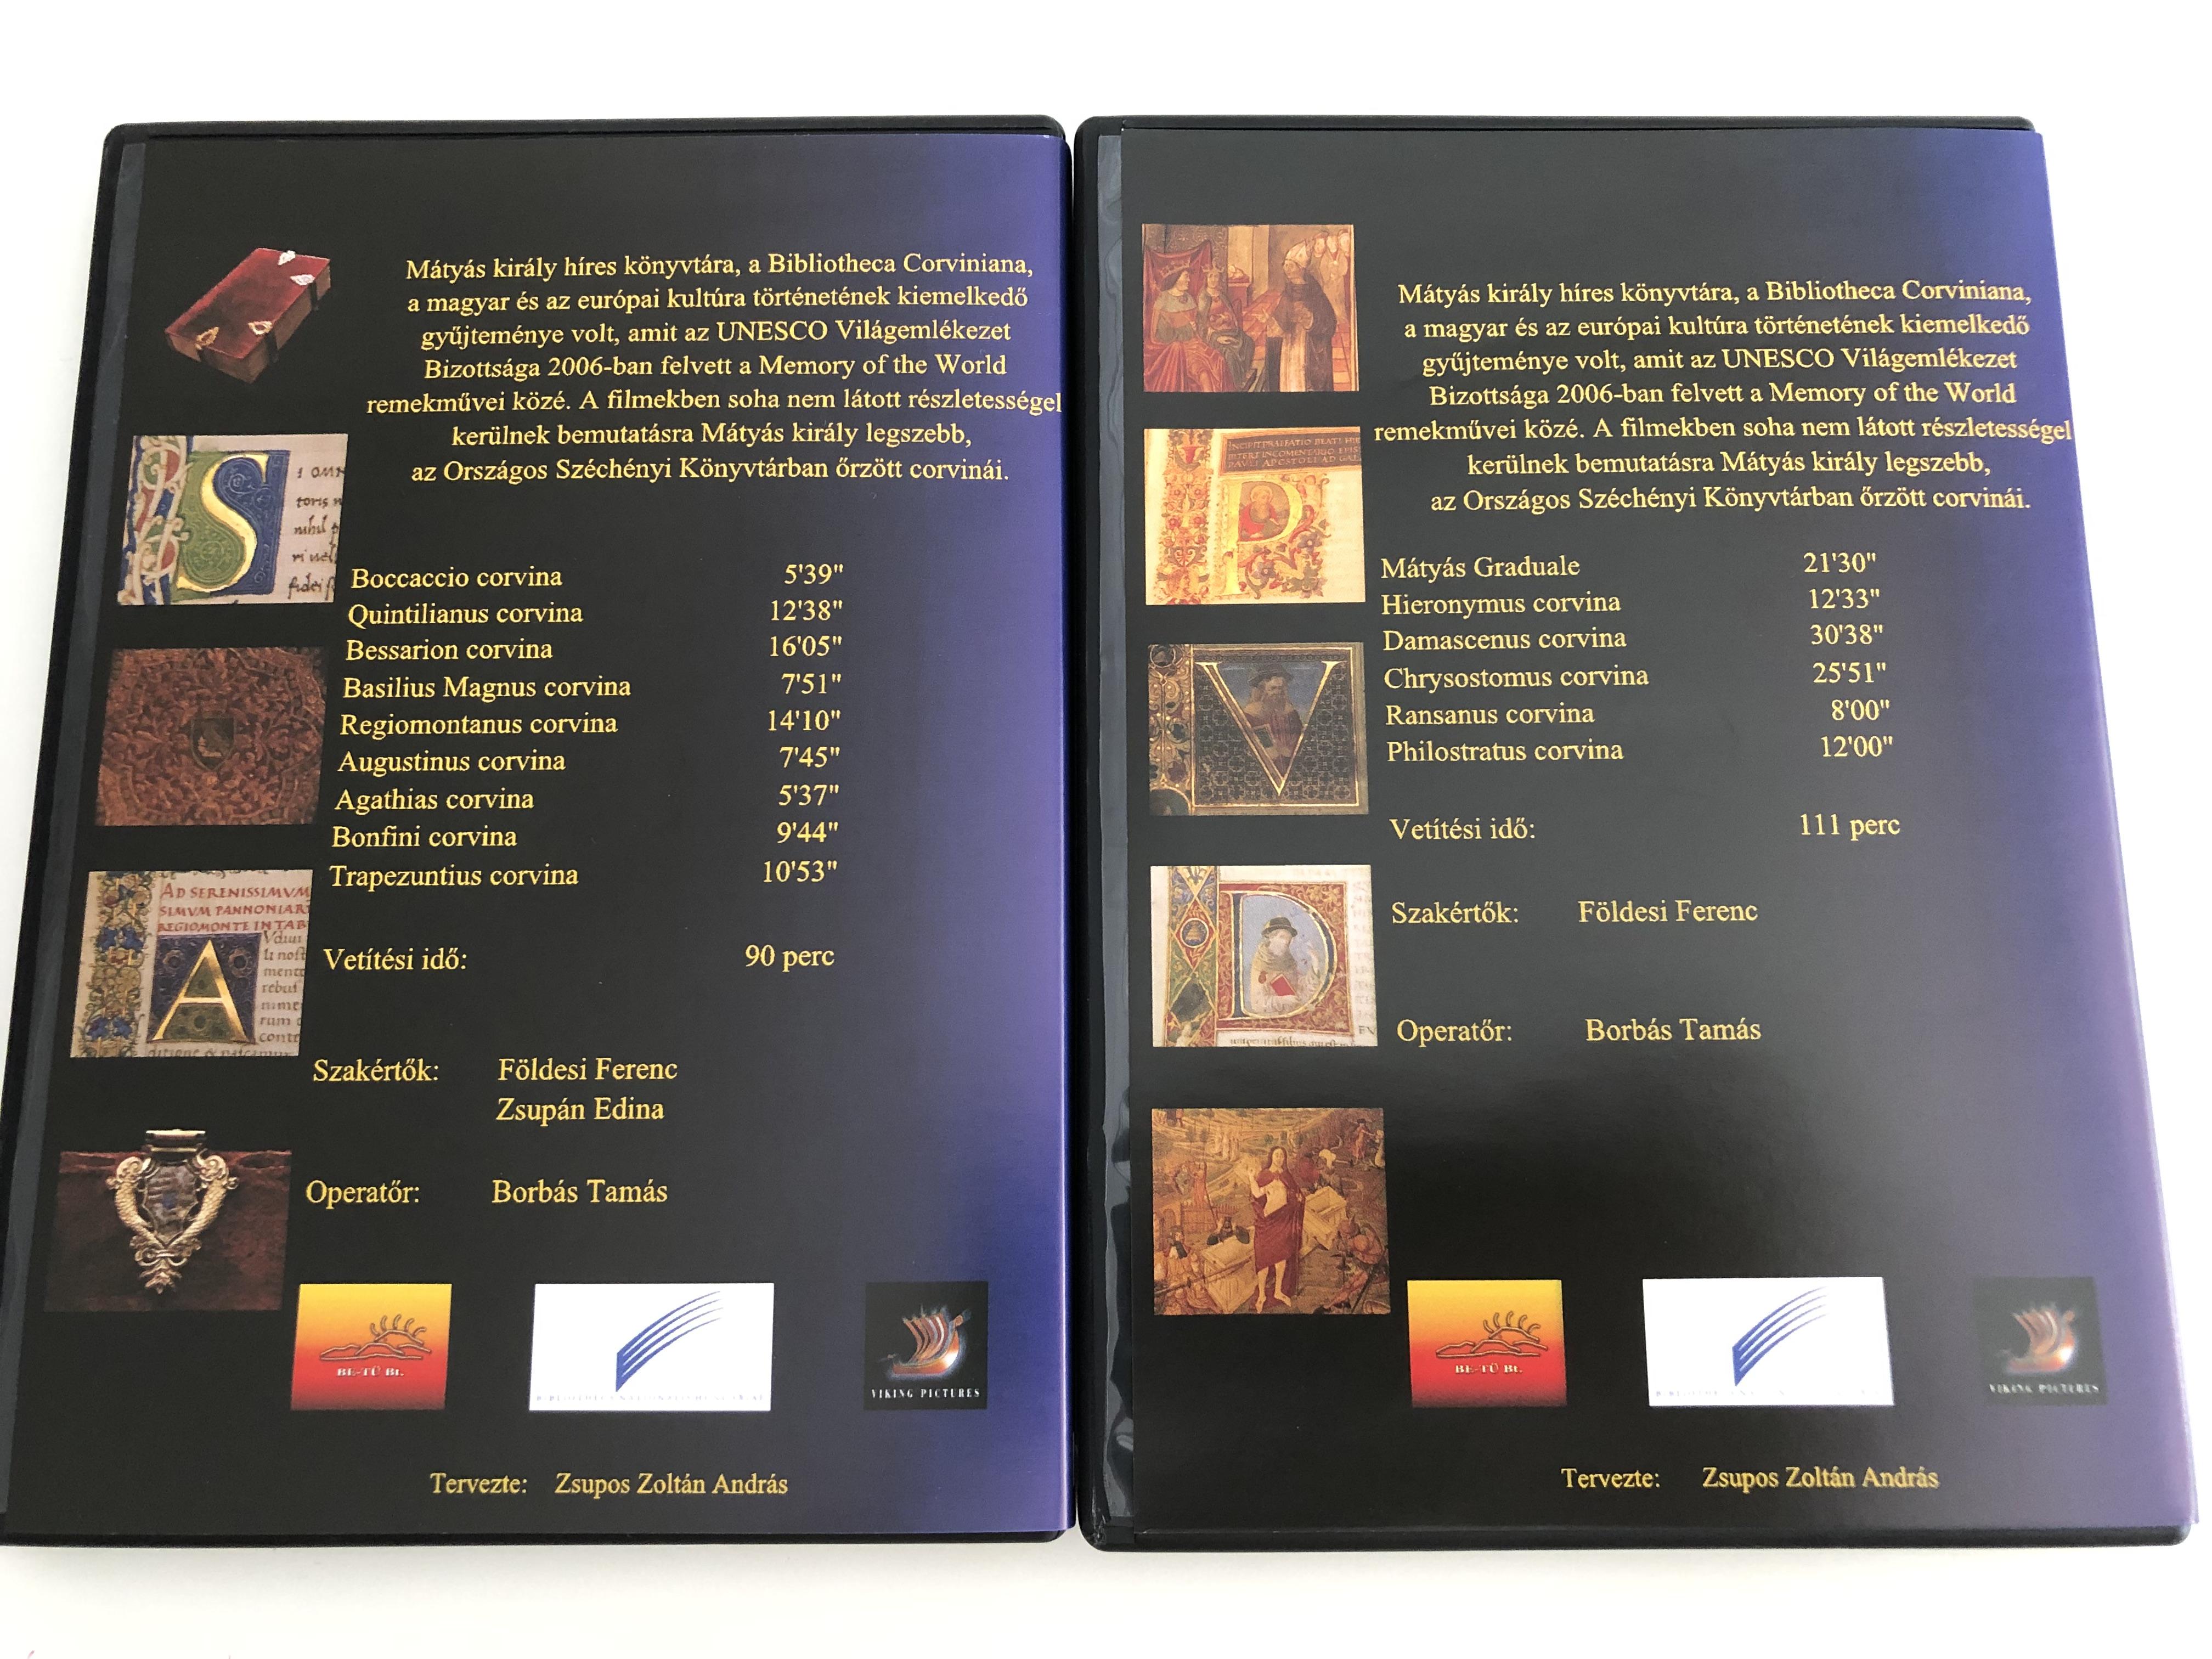 m-ty-s-kir-ly-corvin-i-dvd-set-a-nemzet-k-nyvt-r-nak-kincsei-directed-by-zsupos-zolt-n-hungarian-king-matthias-bibliotheca-corviniana-2-dvd-2-.jpg